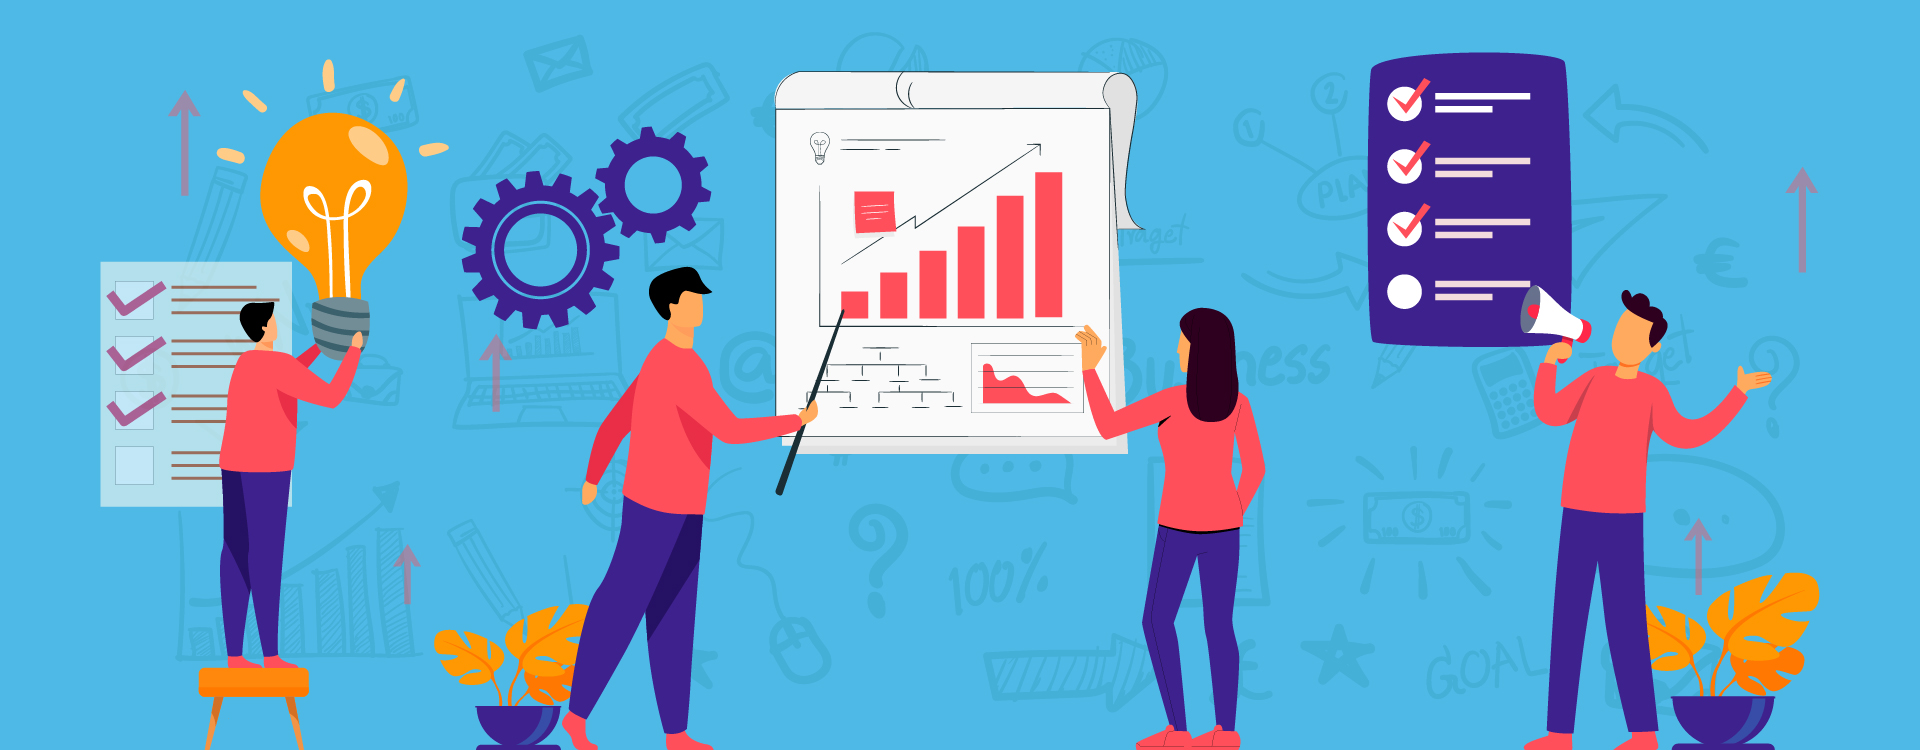 Business Strategies for Successful Entrepreneurs